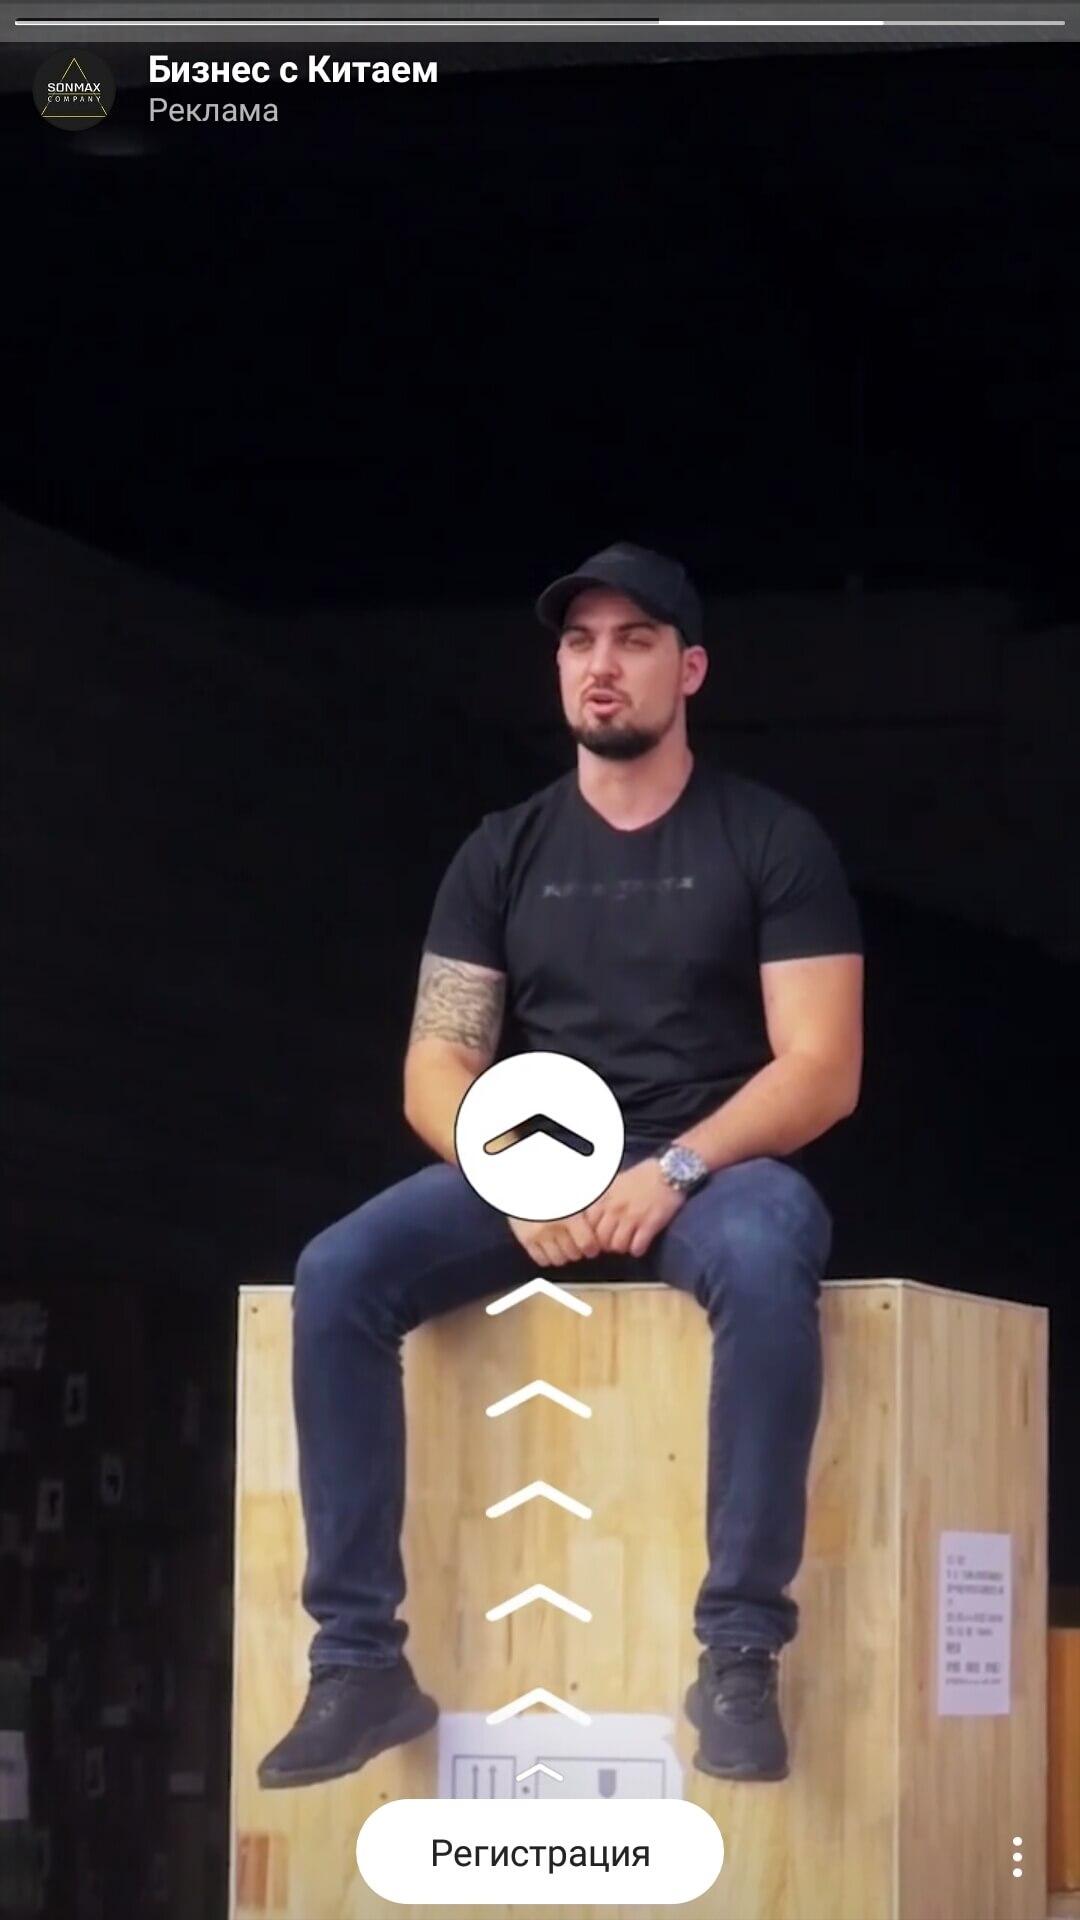 Видеореклама в Сторис Инстаграм